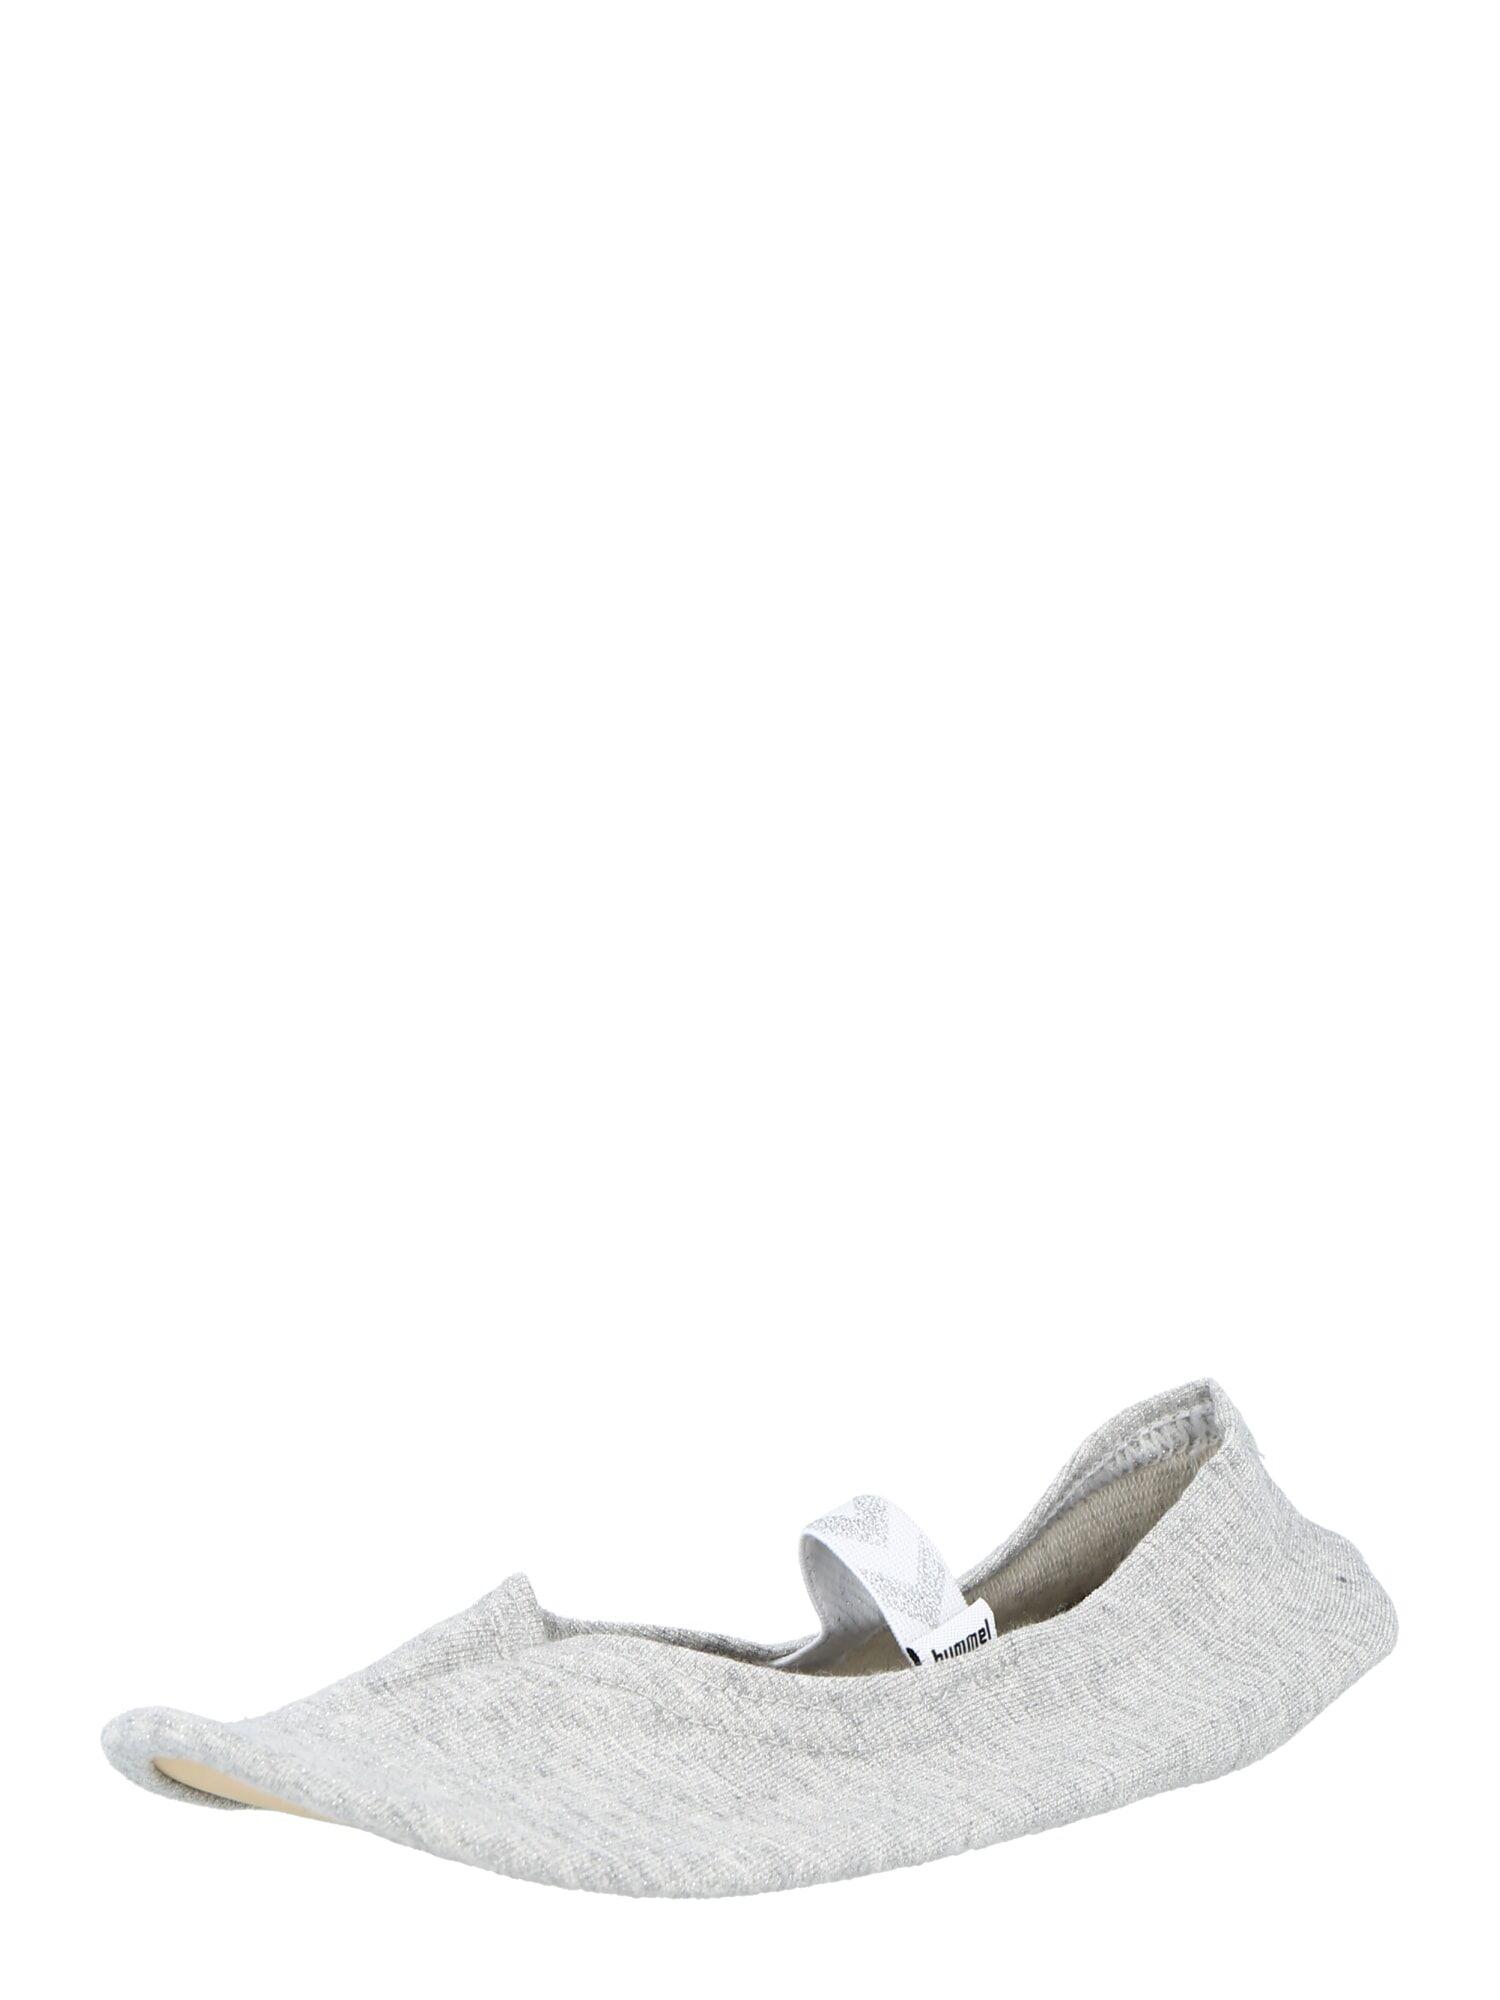 Hummel Chaussure de sport  - Gris - Taille: 33 - boy